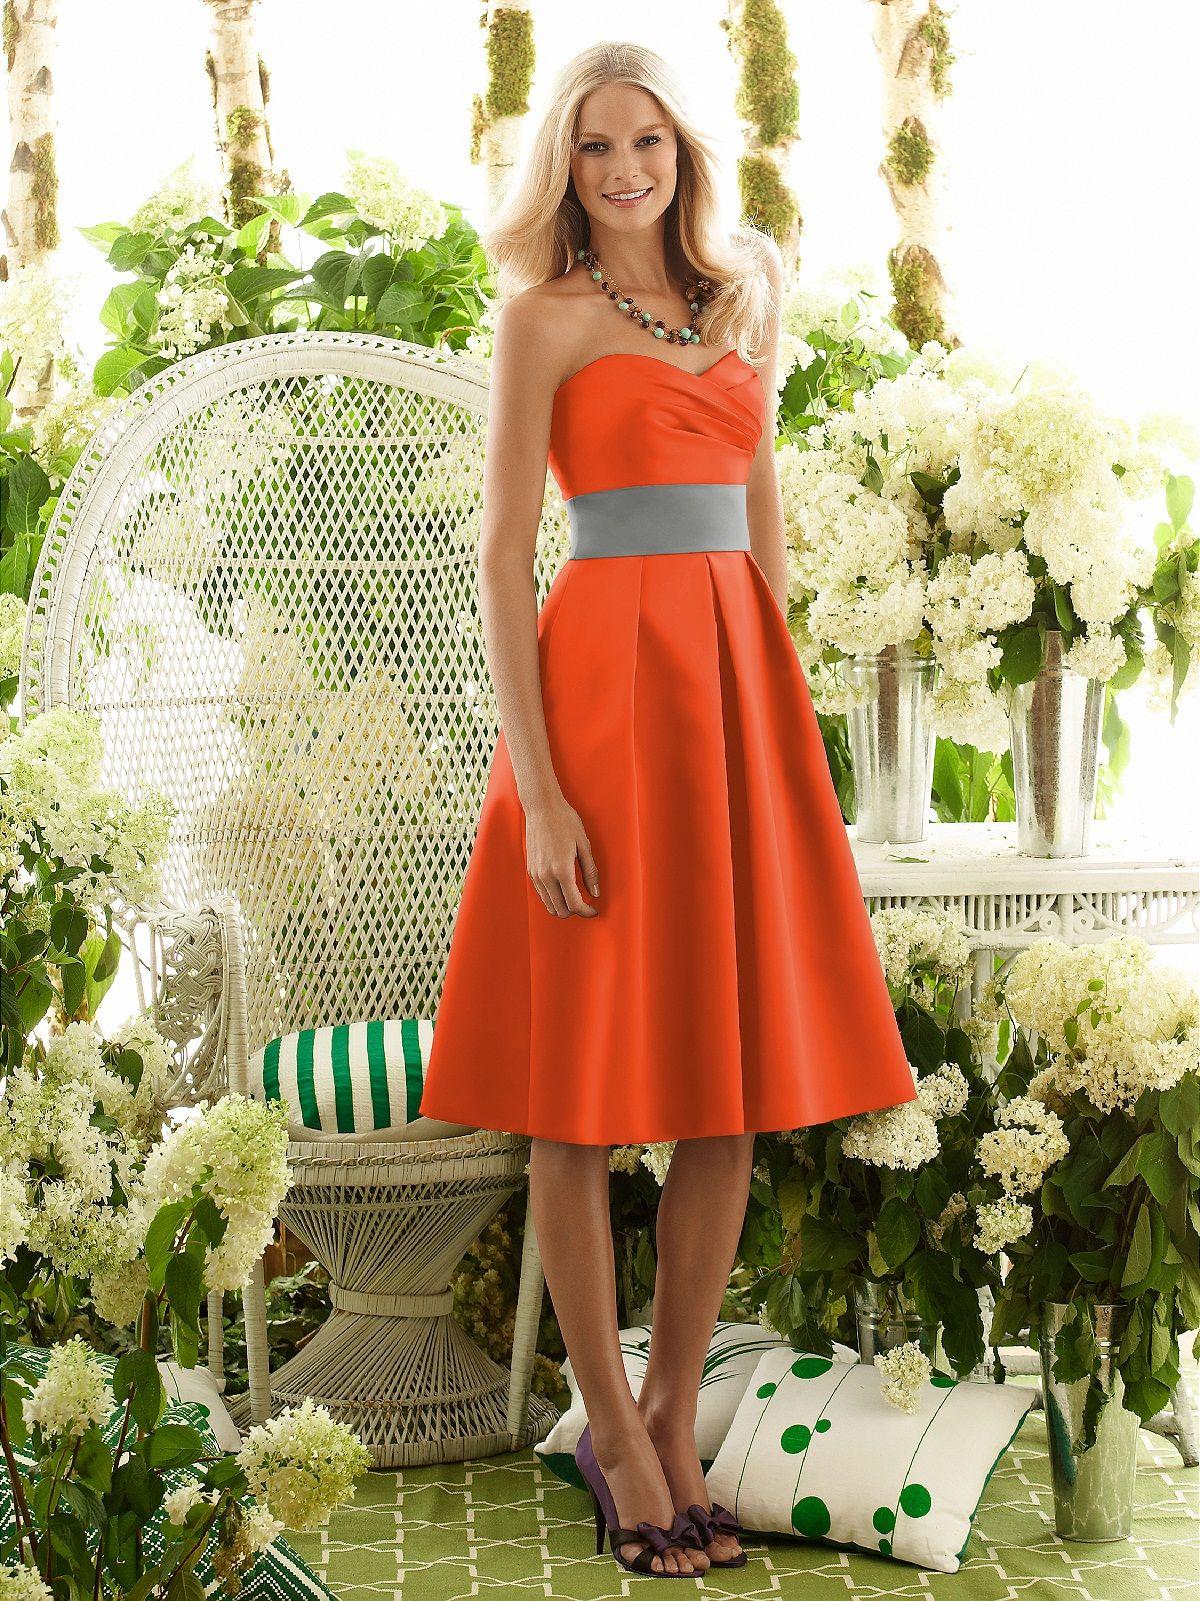 Orange bridesmaids dresses with gray sash this is what i want orange bridesmaids dresses with gray sash this is what i want ombrellifo Choice Image